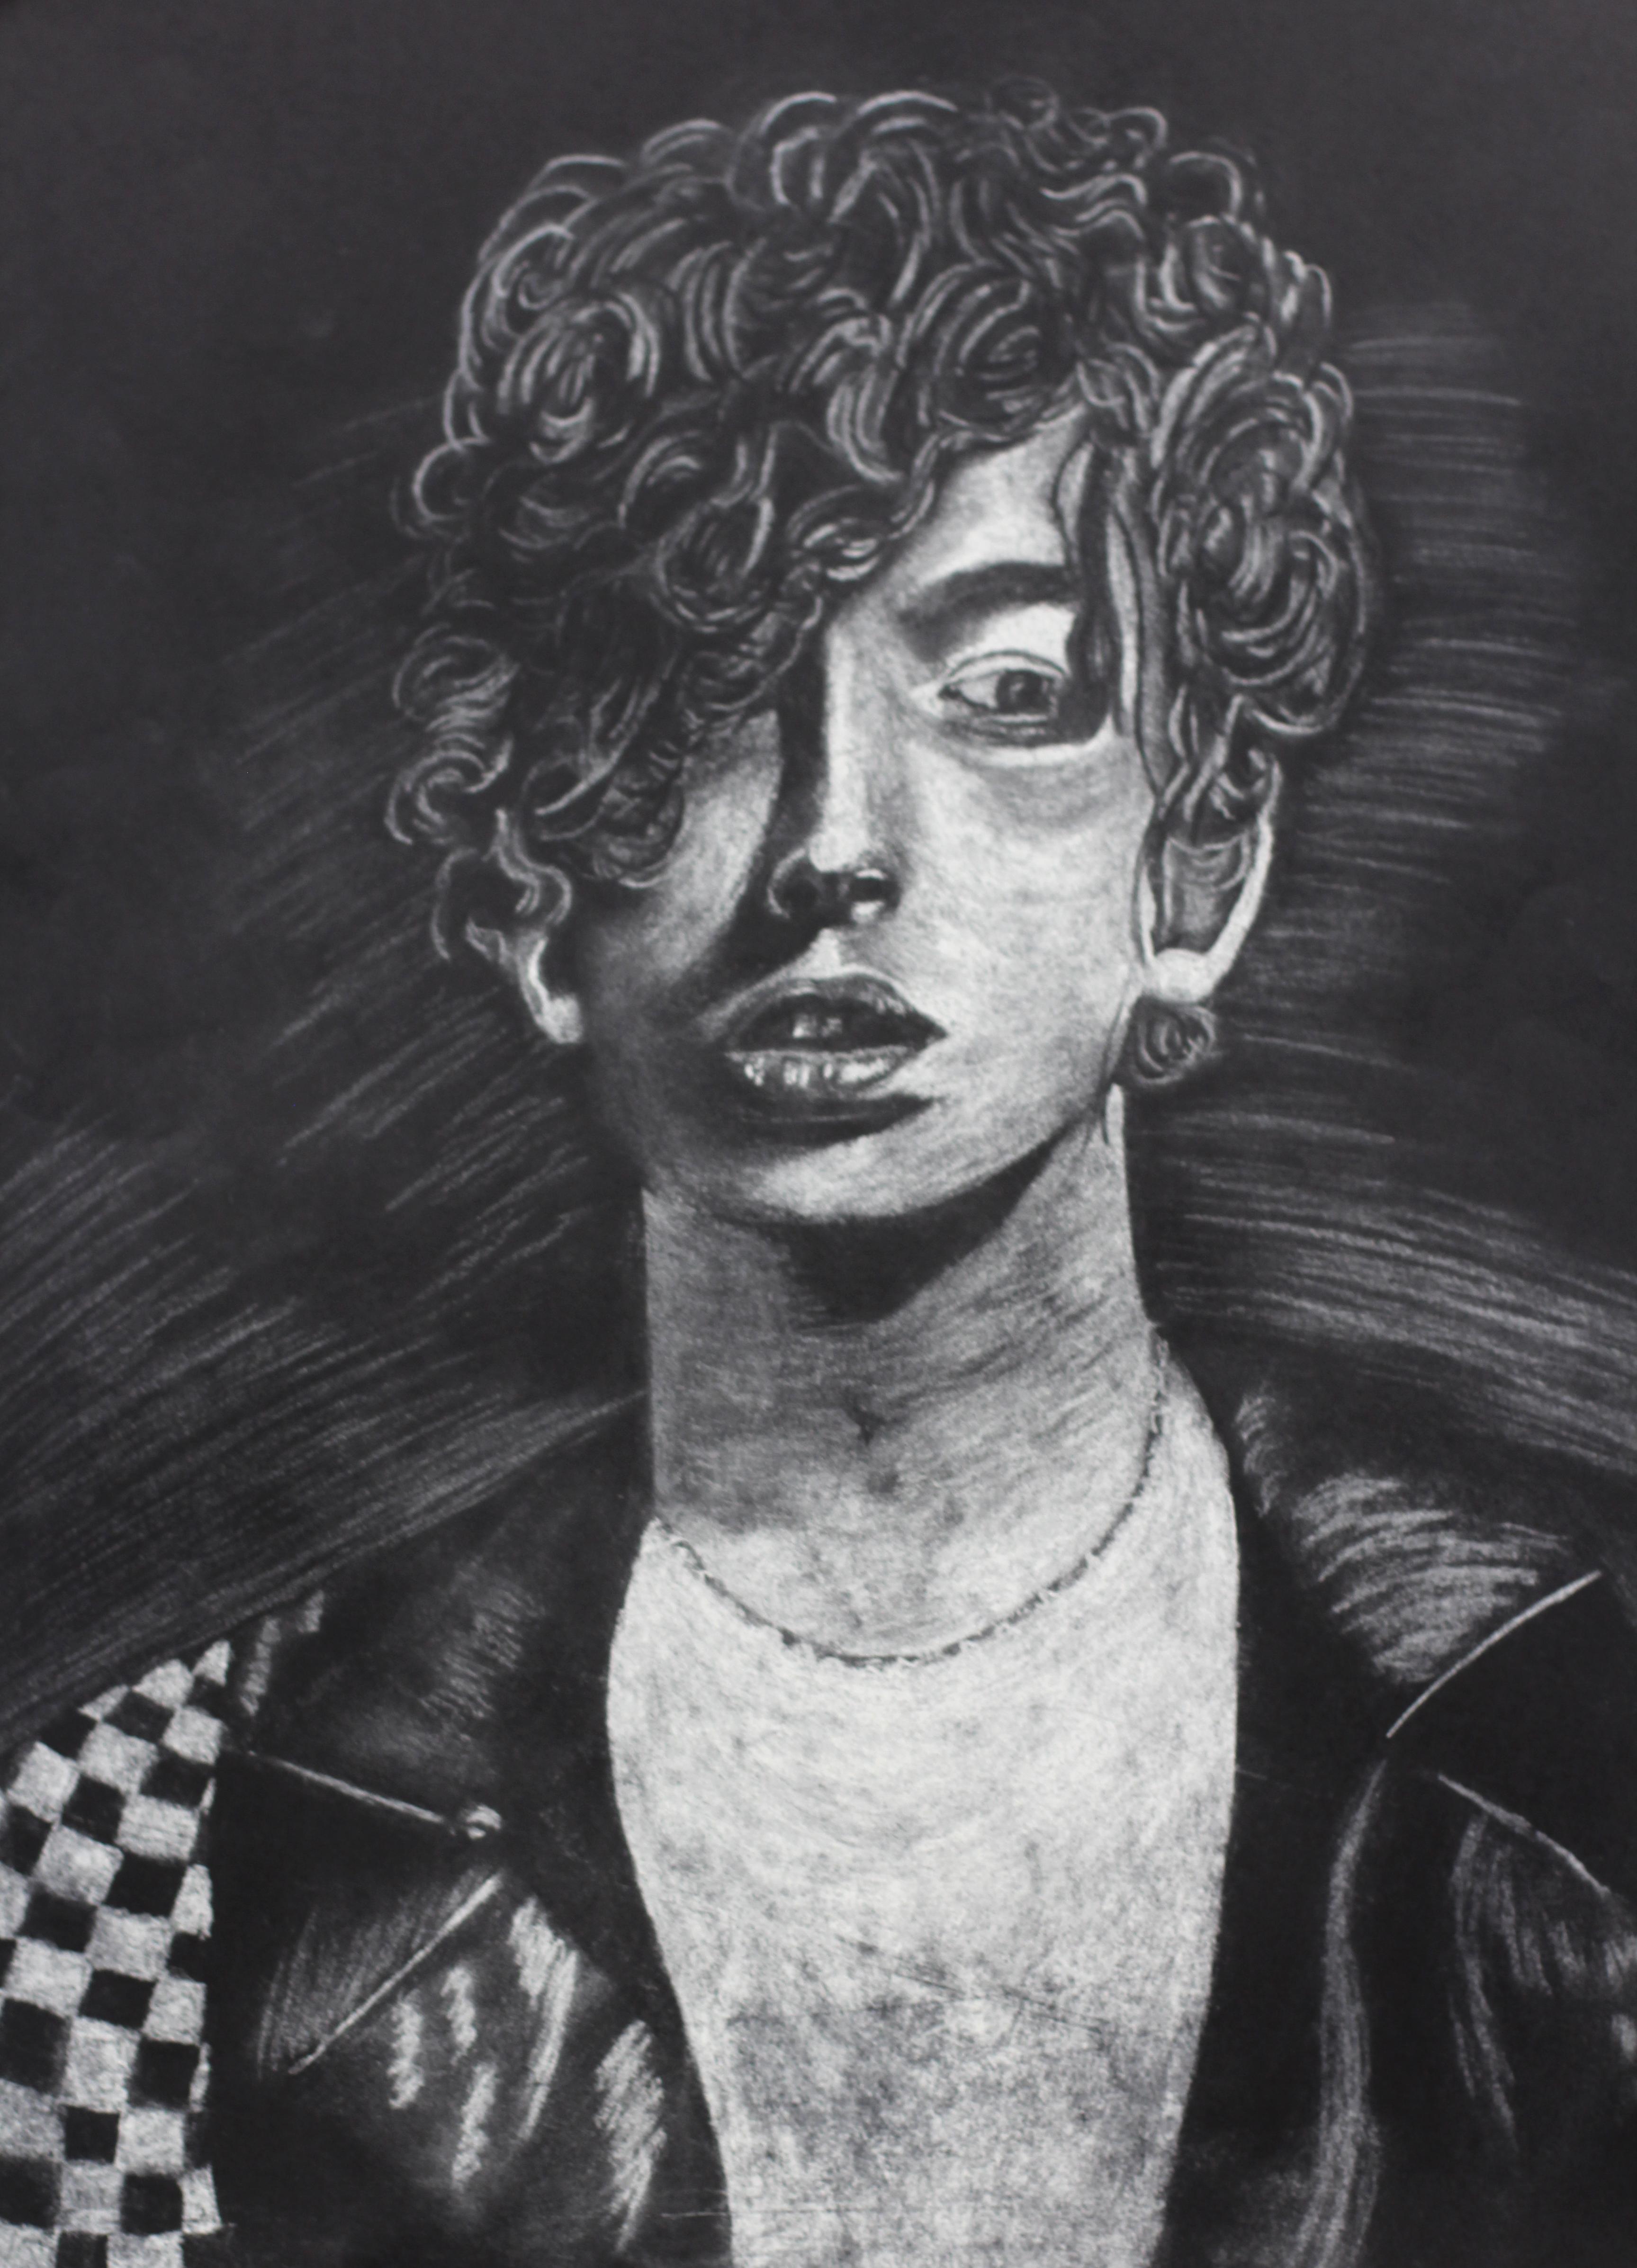 AHS Art charcoal drawing of boy